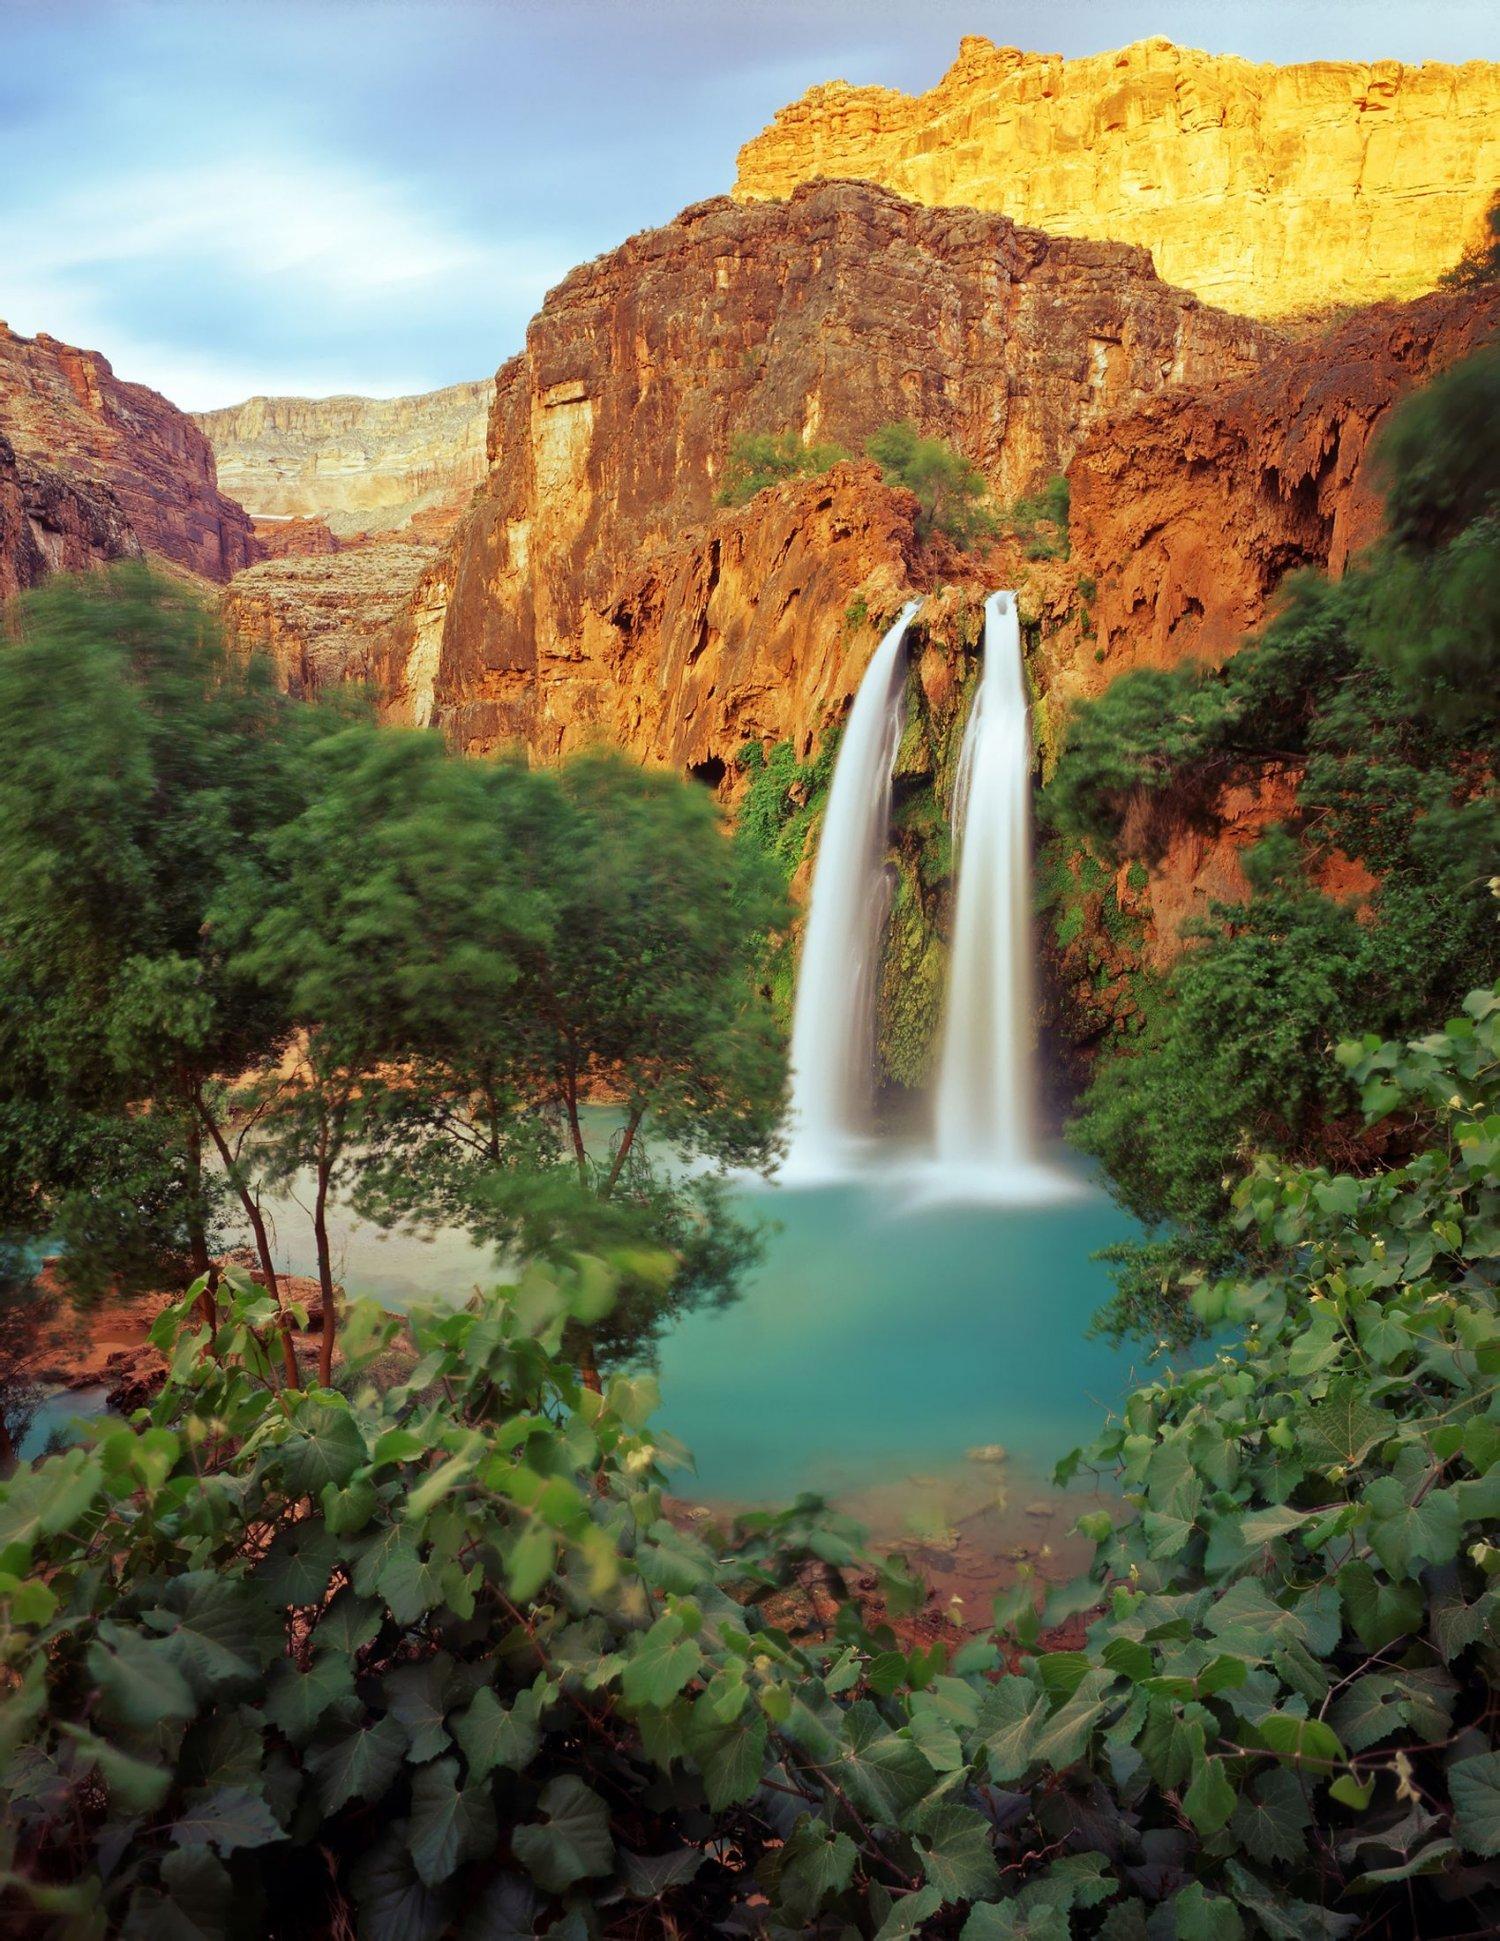 Havasu Falls Wallpaper Cach 233 Es Dans Le Grand Canyon Les Chutes D Havasu Sont Les